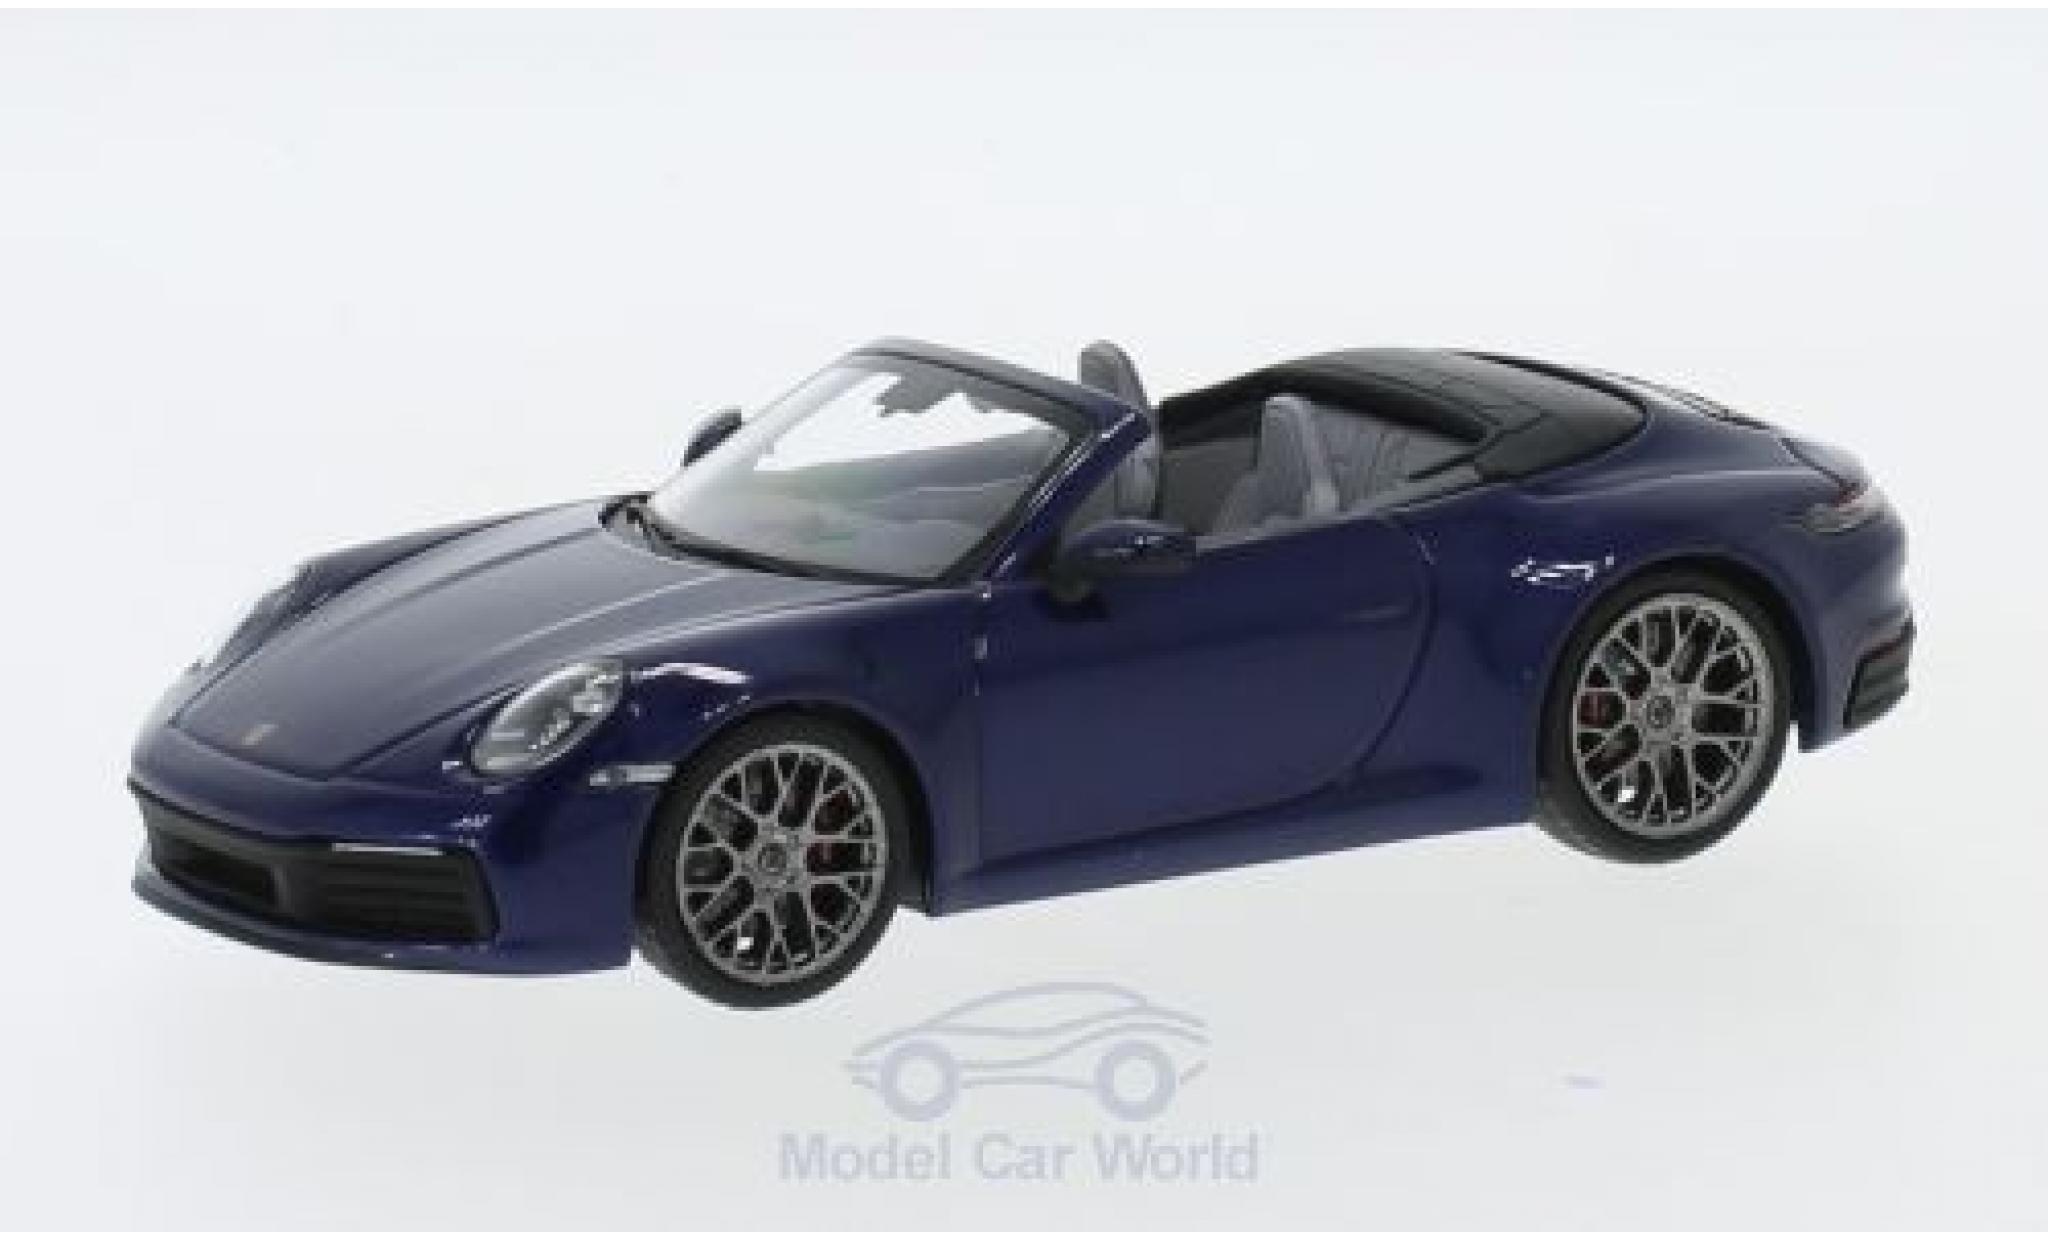 Porsche 911 1/43 I Minichamps (992) Carrera 4S Cabriolet métallisé bleue 2019